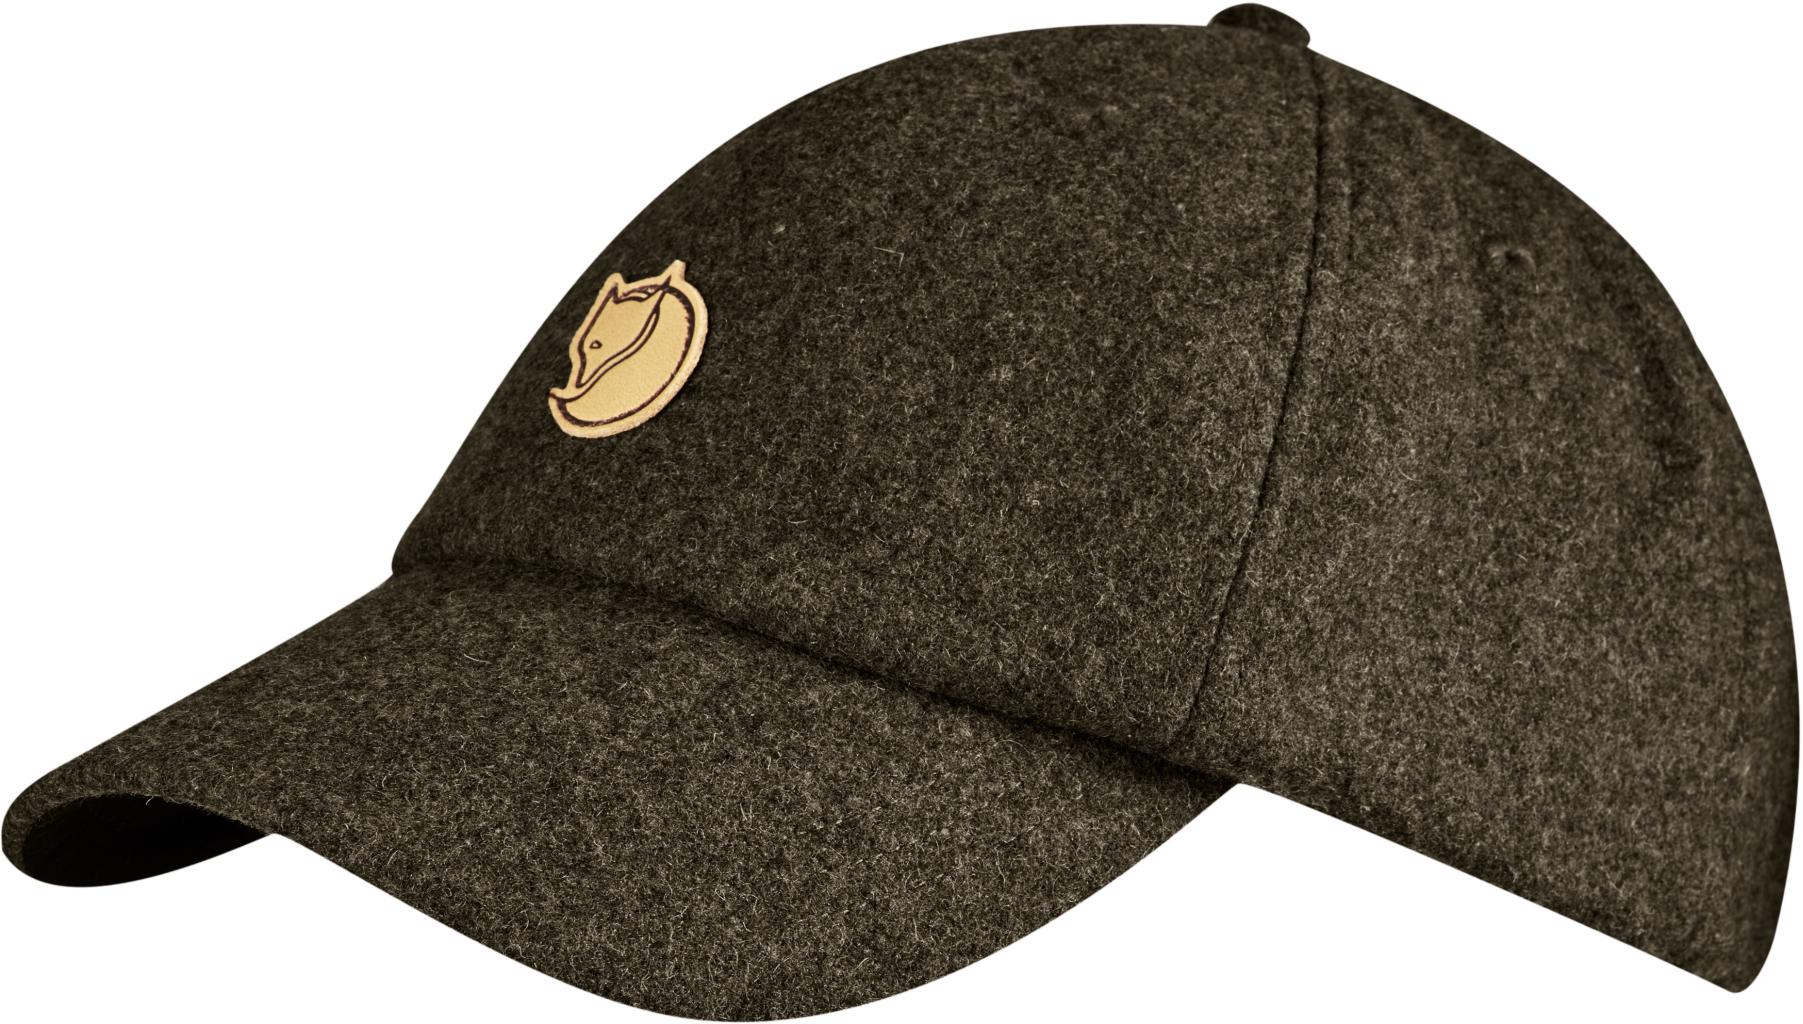 FjallRaven Ovik Wool Cap Dark Olive-30